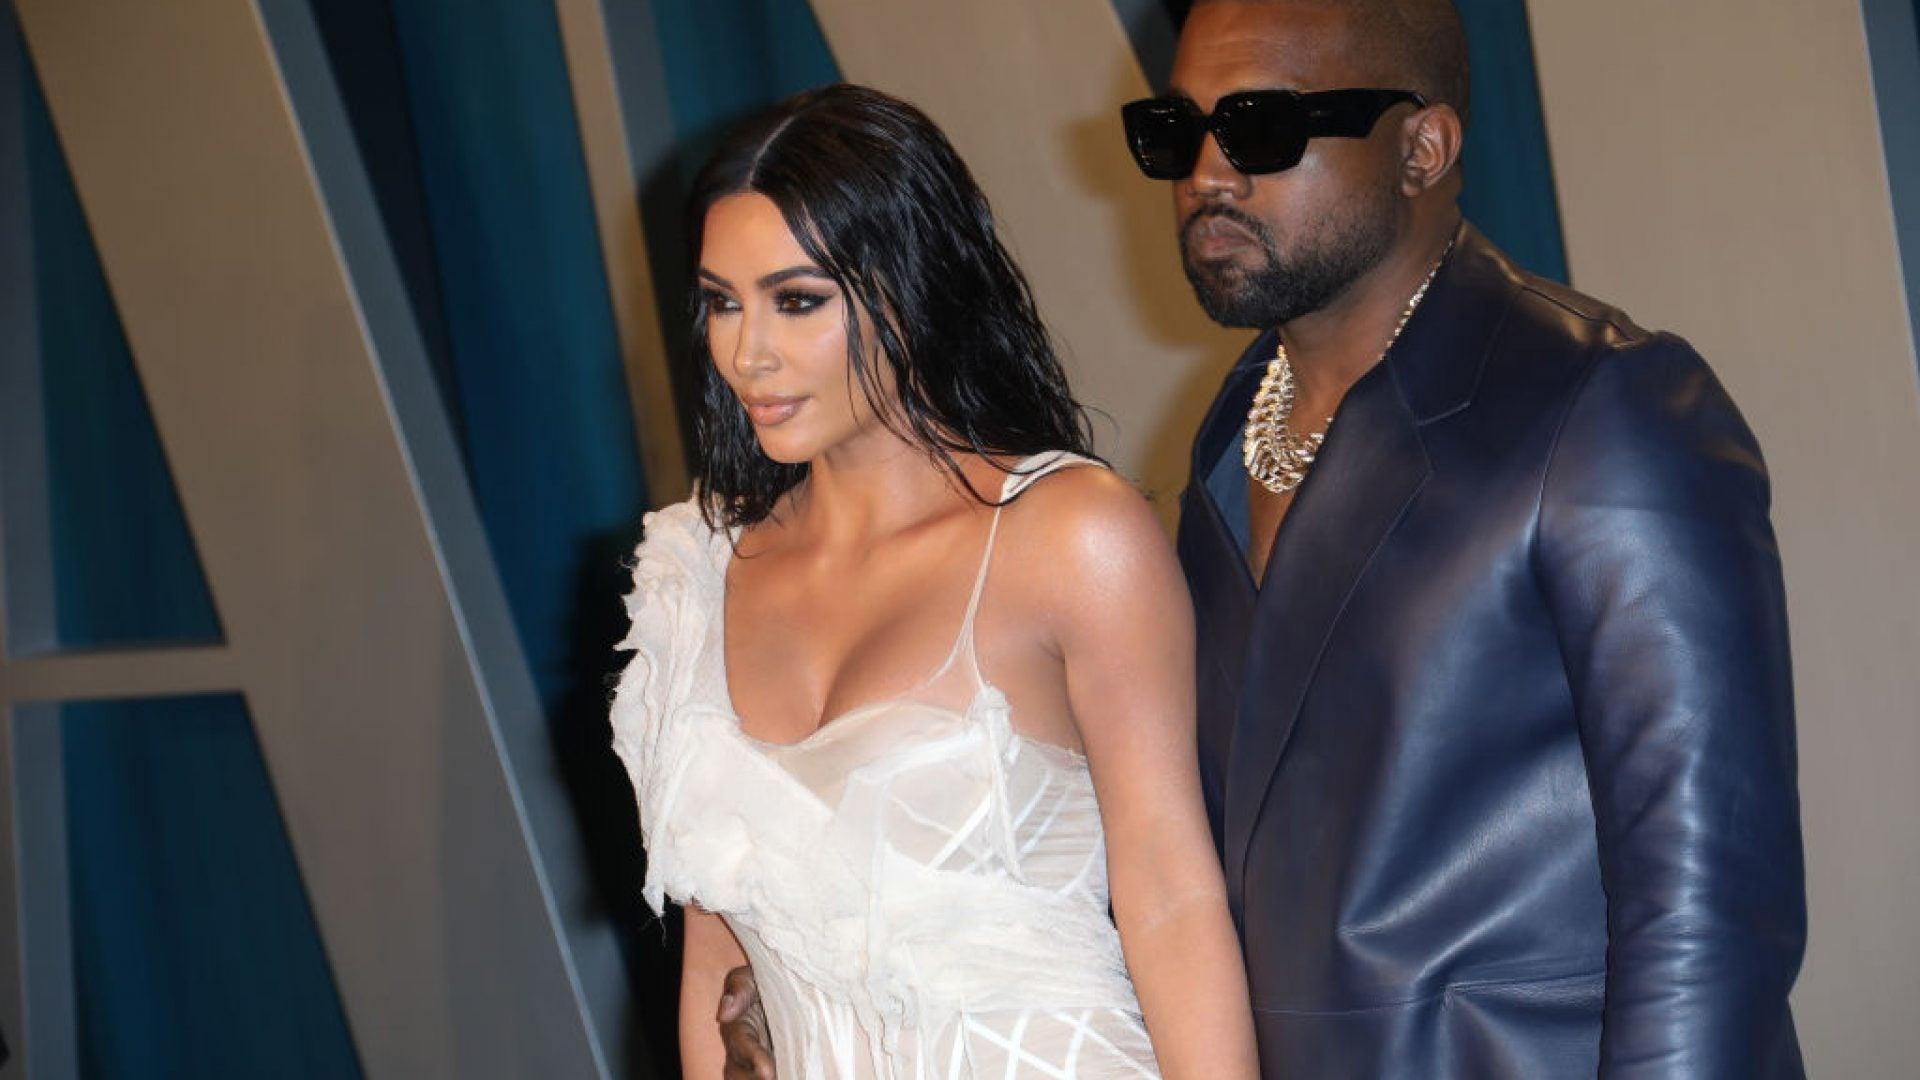 Kim Kardashian Speaks Out About Husband Kanye West's Mental Health